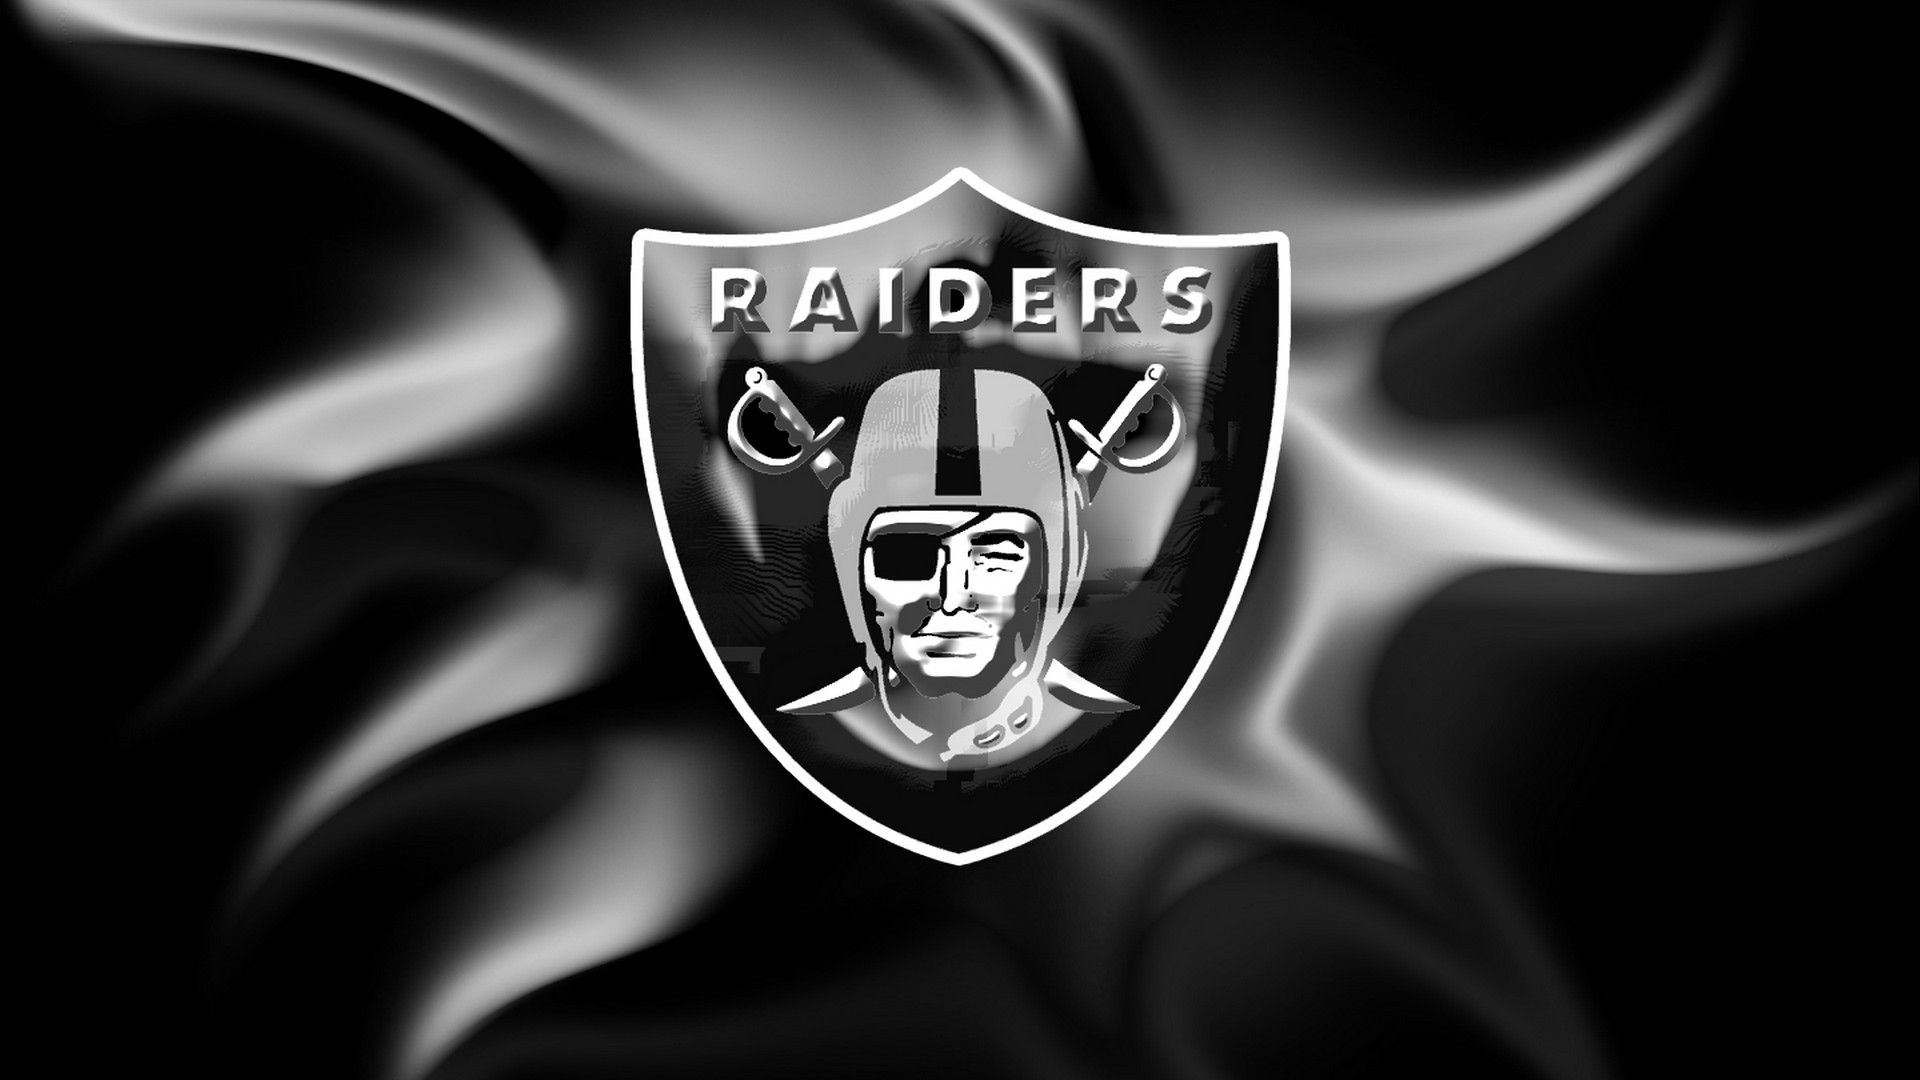 Nfl Wallpapers Oakland Raiders Oakland Raiders Wallpapers Raiders